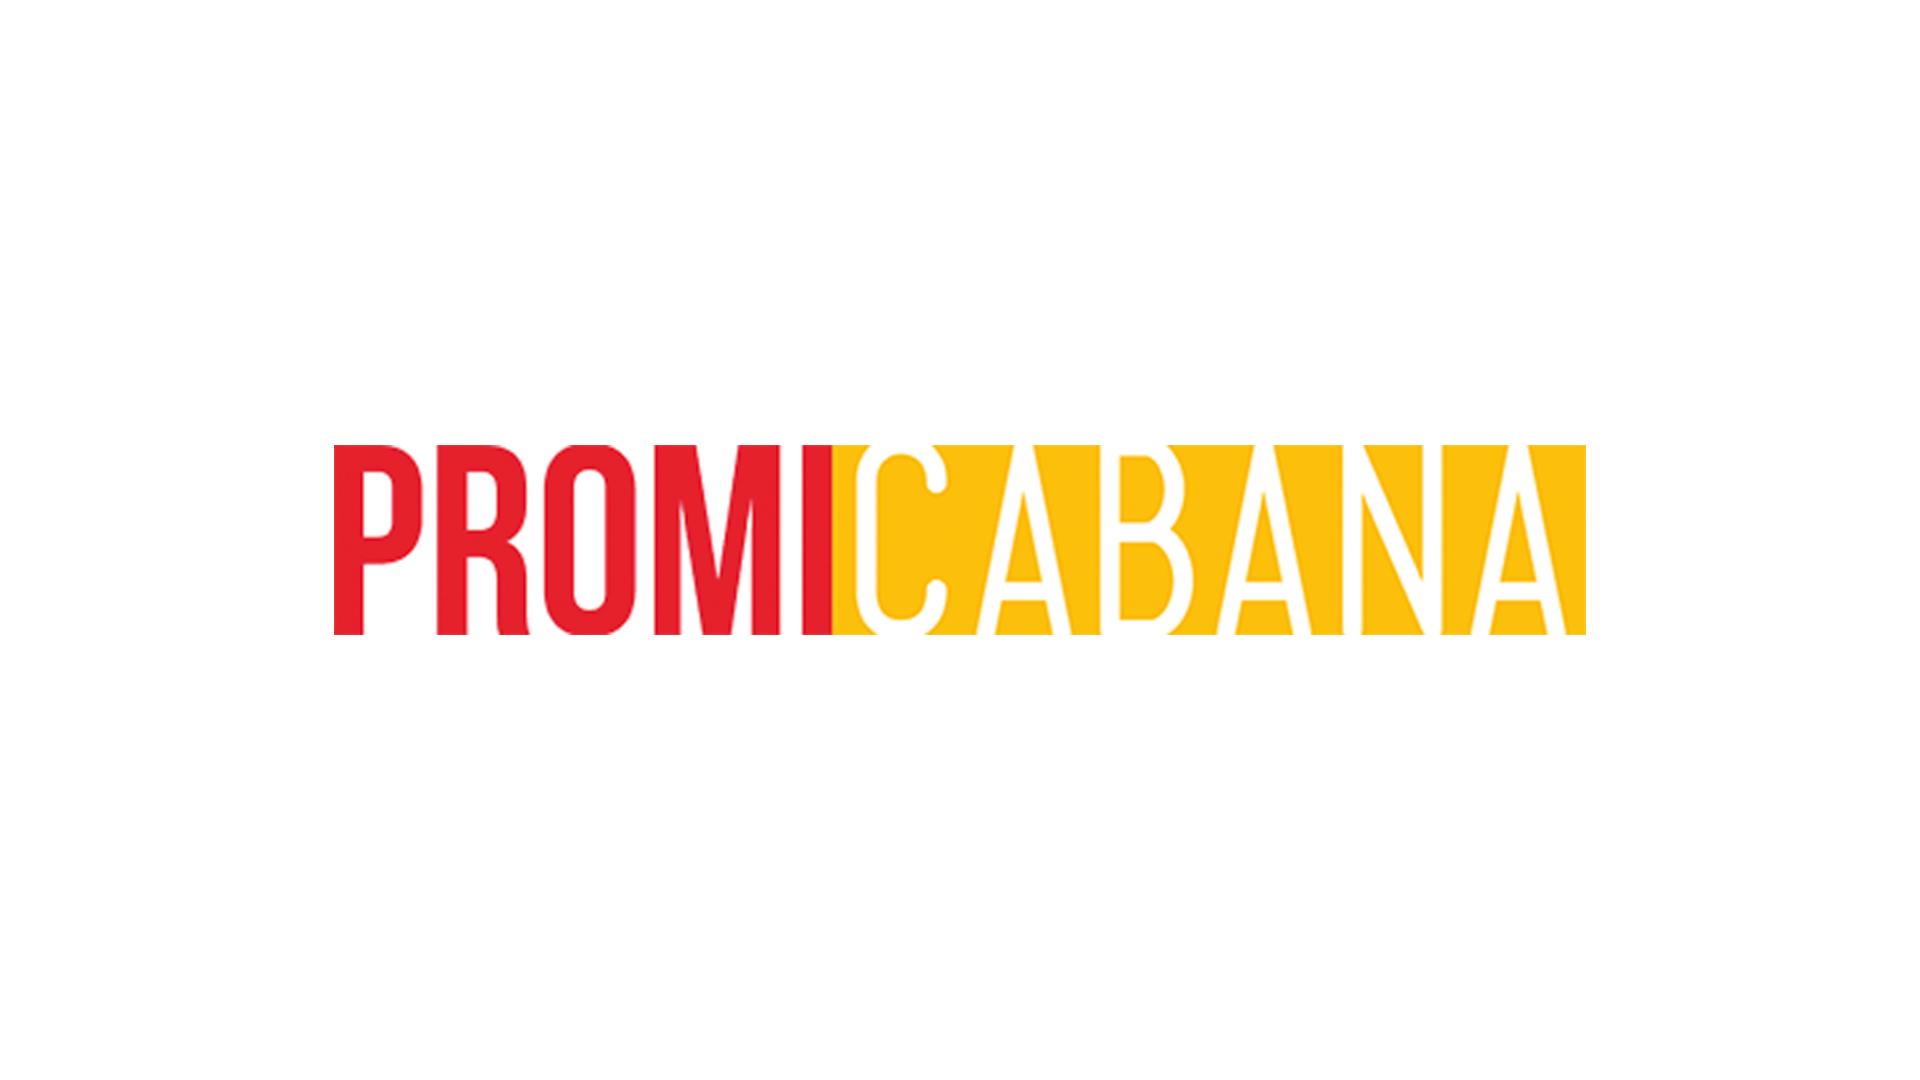 Casey-Neistat-Youtube-Rewind-2017